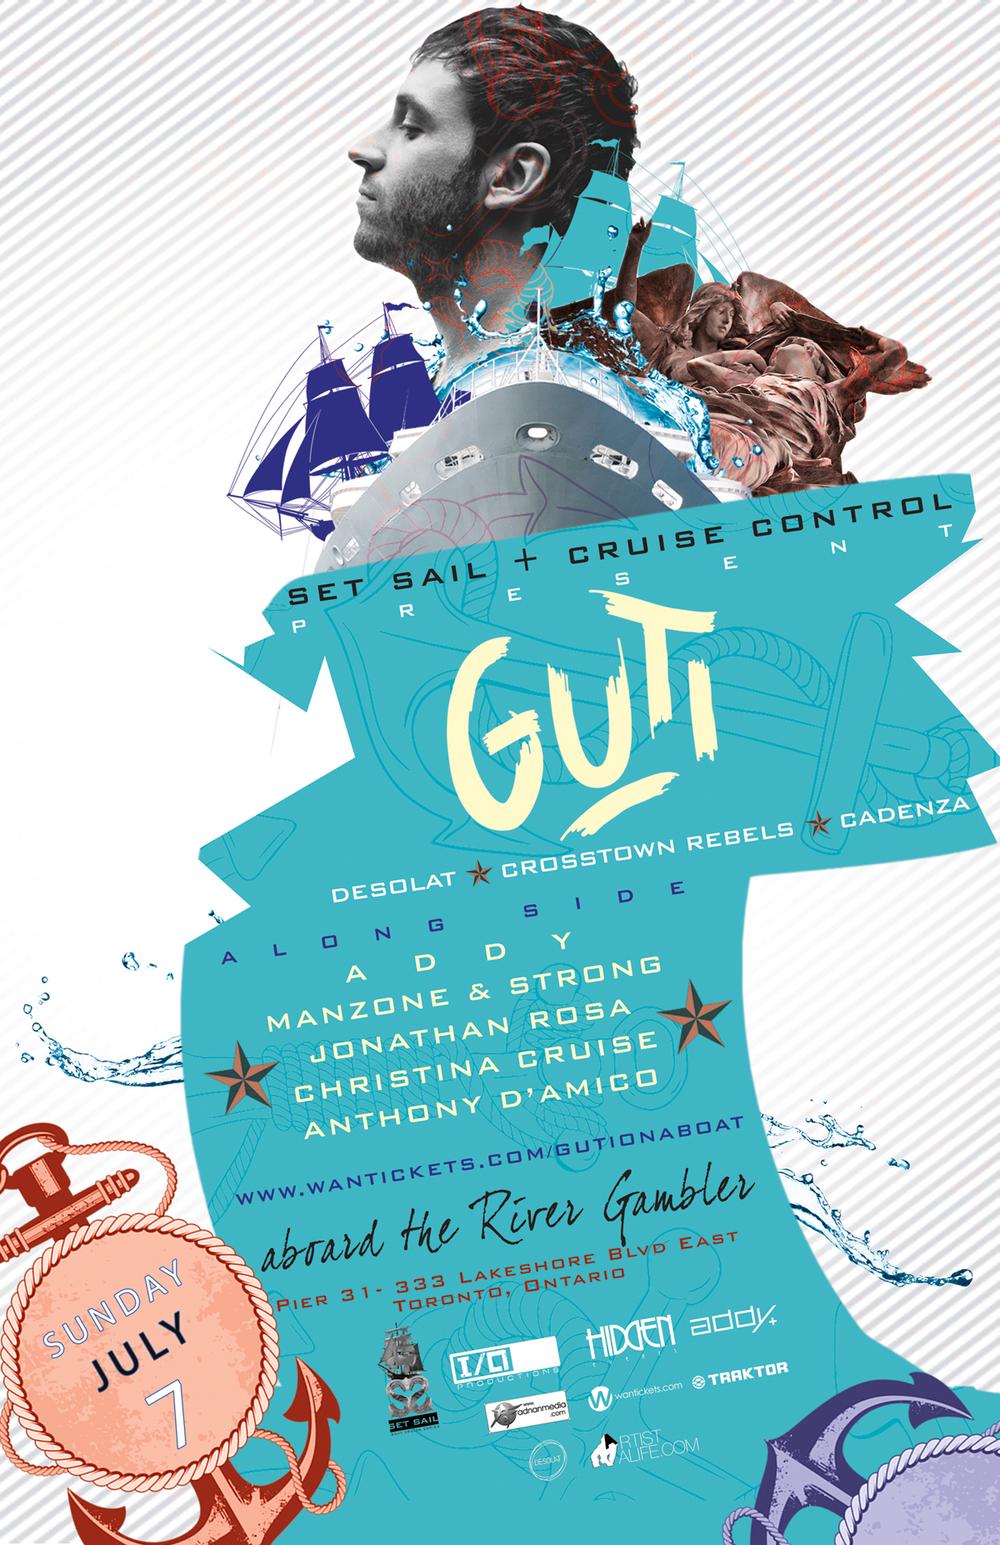 Guti w/ Addy, Manzone & Strong, Jonathan Rosa, Christina Cruise + More Toronto